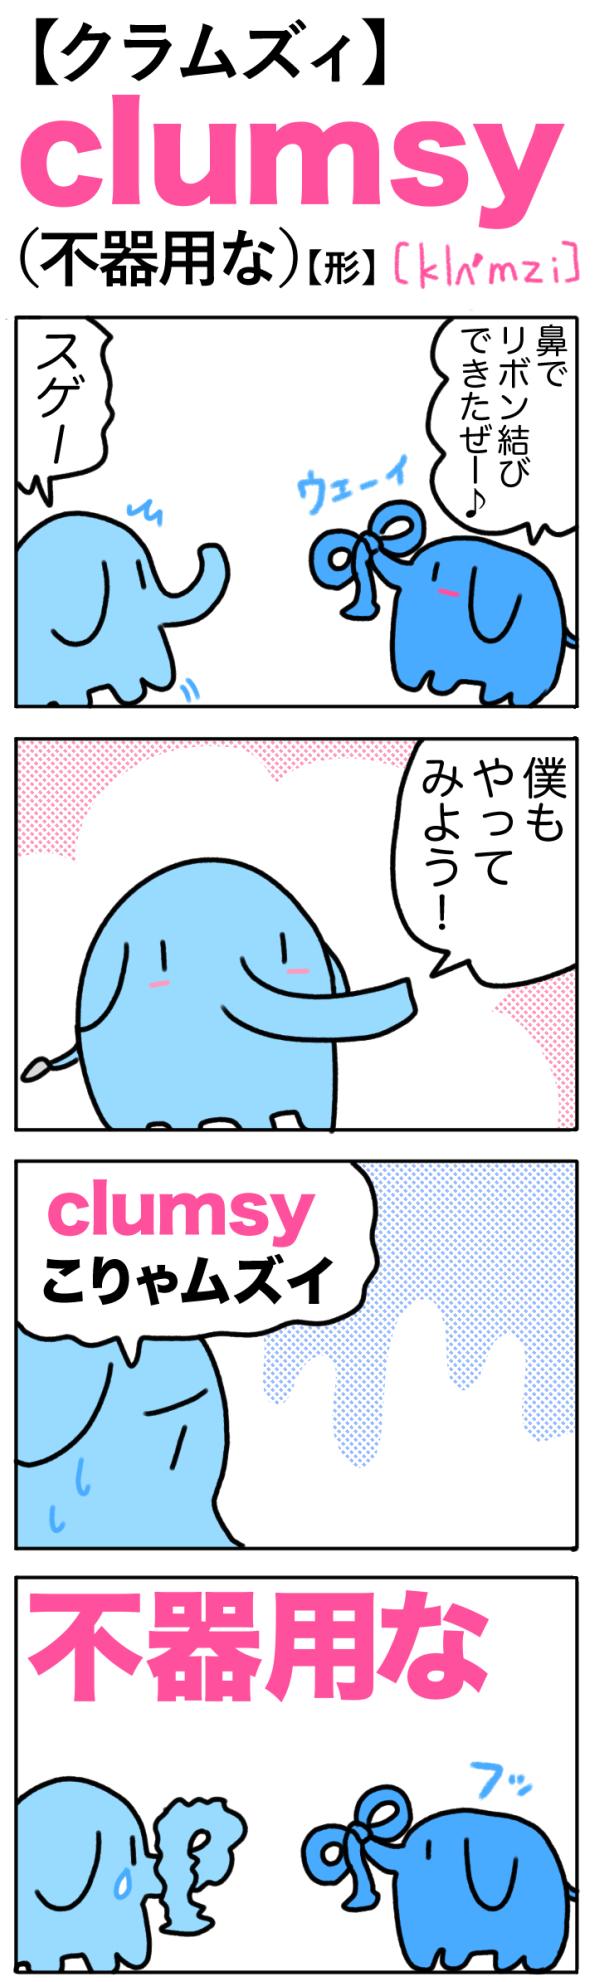 clumsy(不器用な)の語呂合わせ英単語